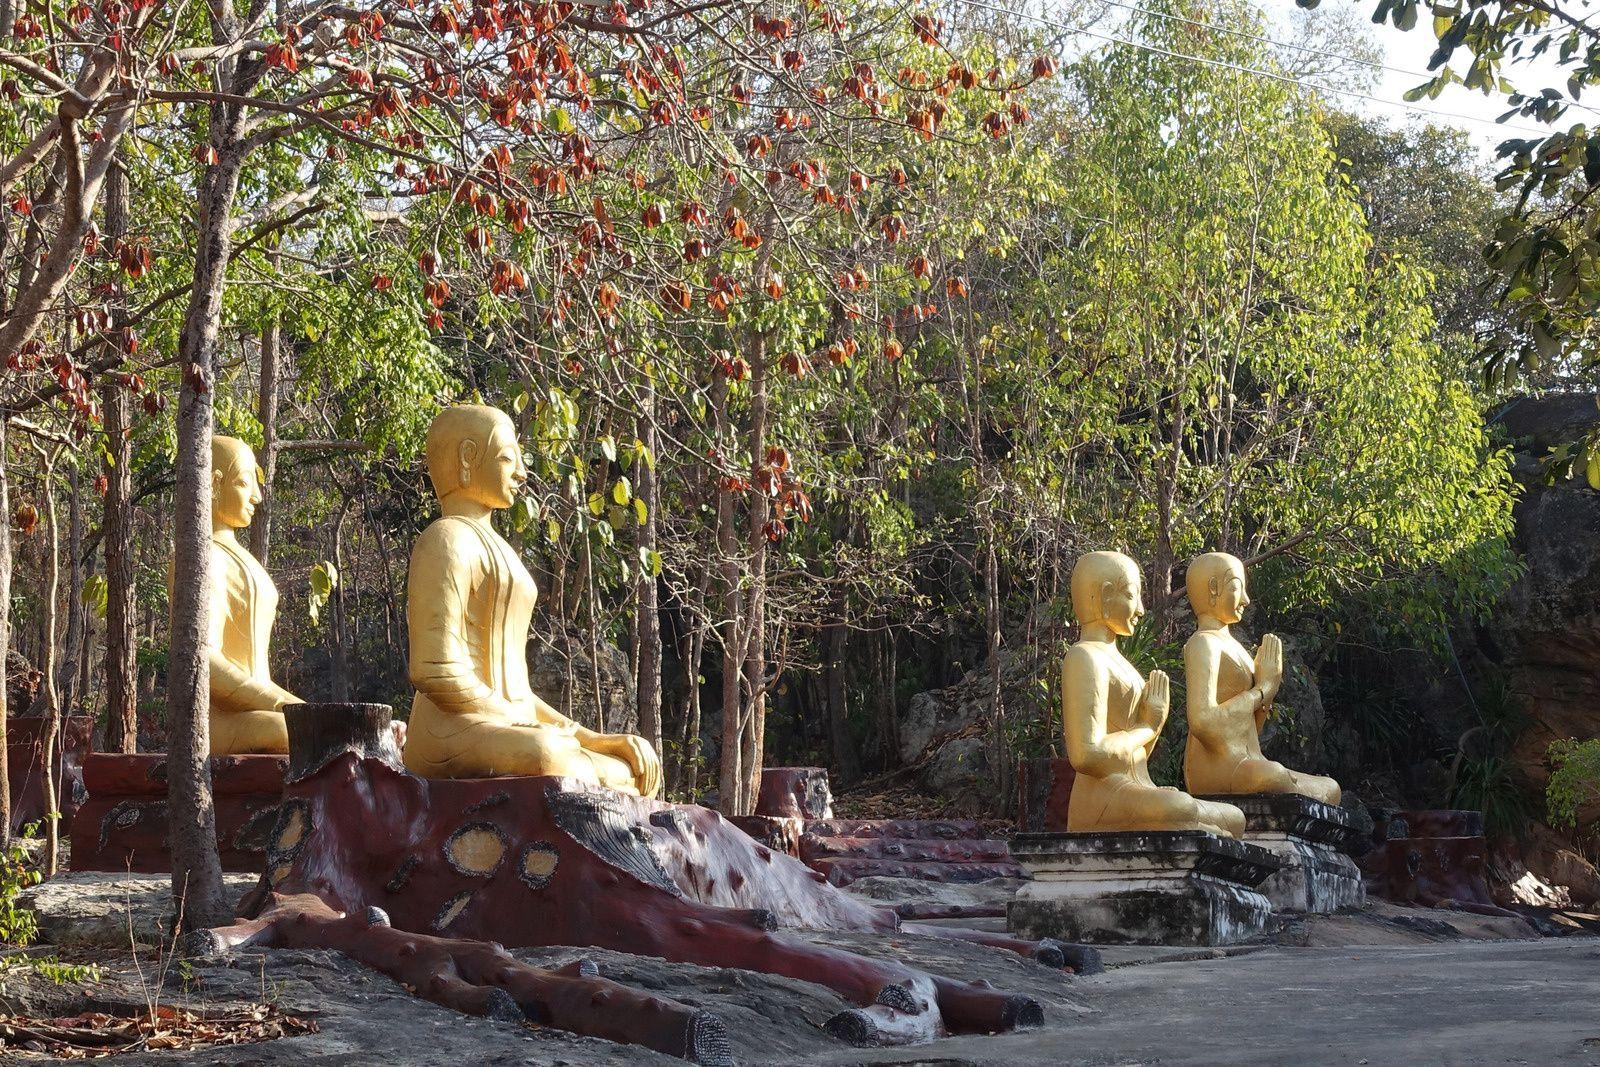 Photo numéro 23  (Wat Khaen Ubonratana Dam))